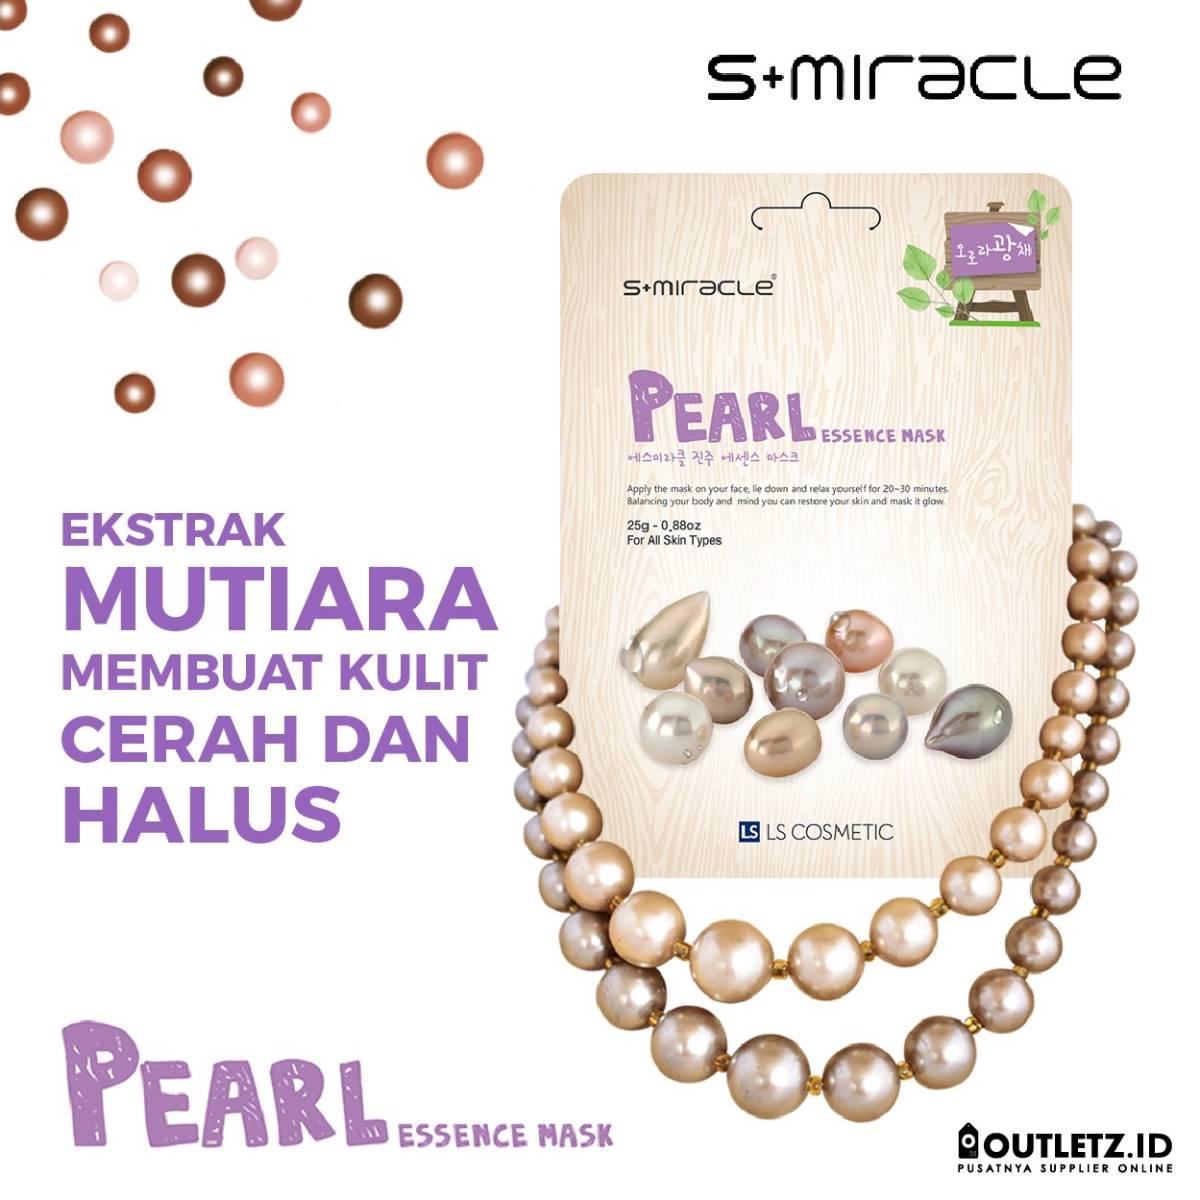 Masker Wajah Korea Pearl - S+miracle Pearl Essence Mask